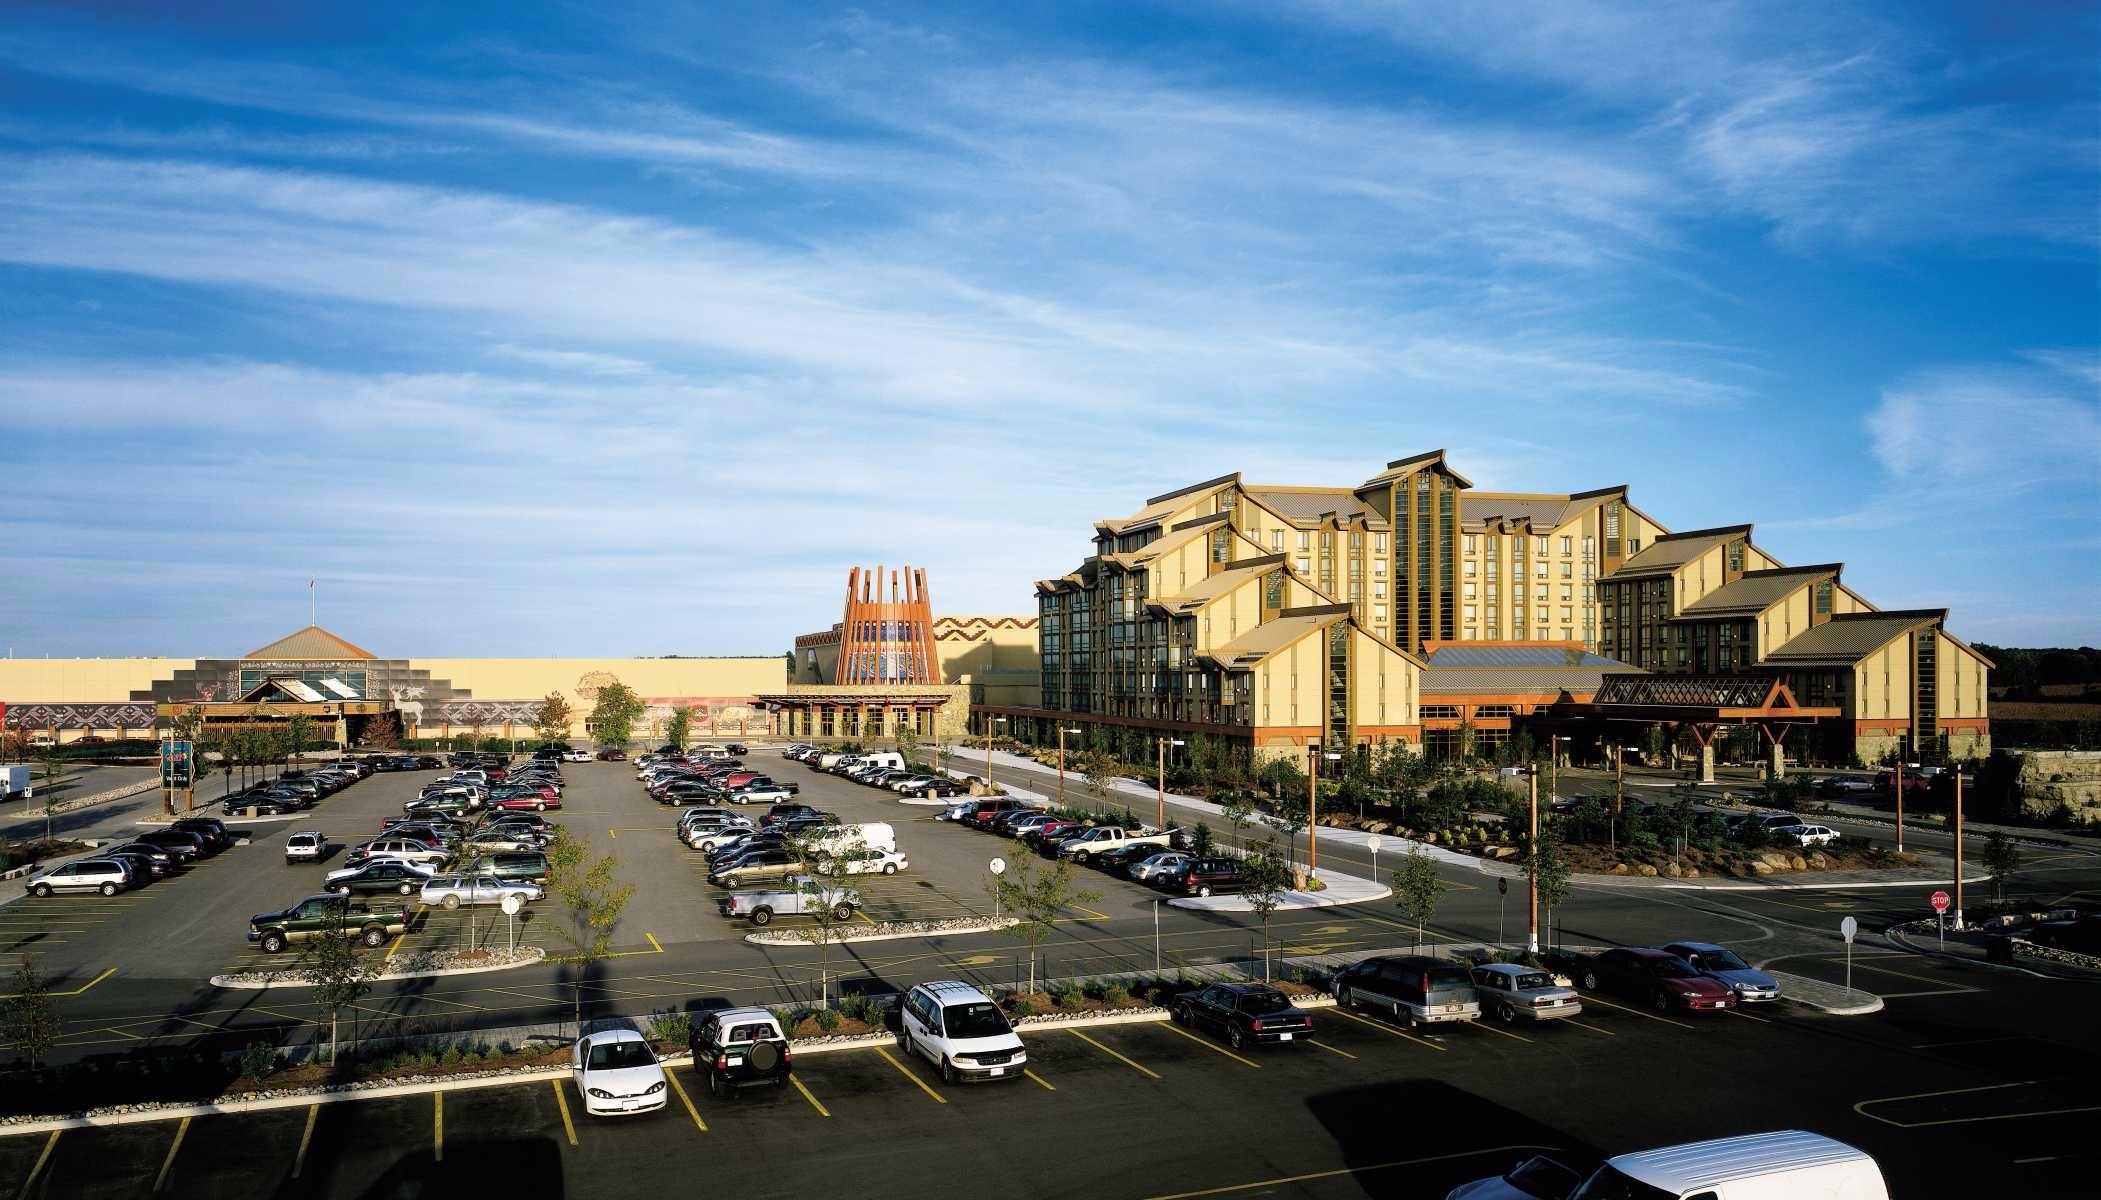 Hotels casino rama orillia